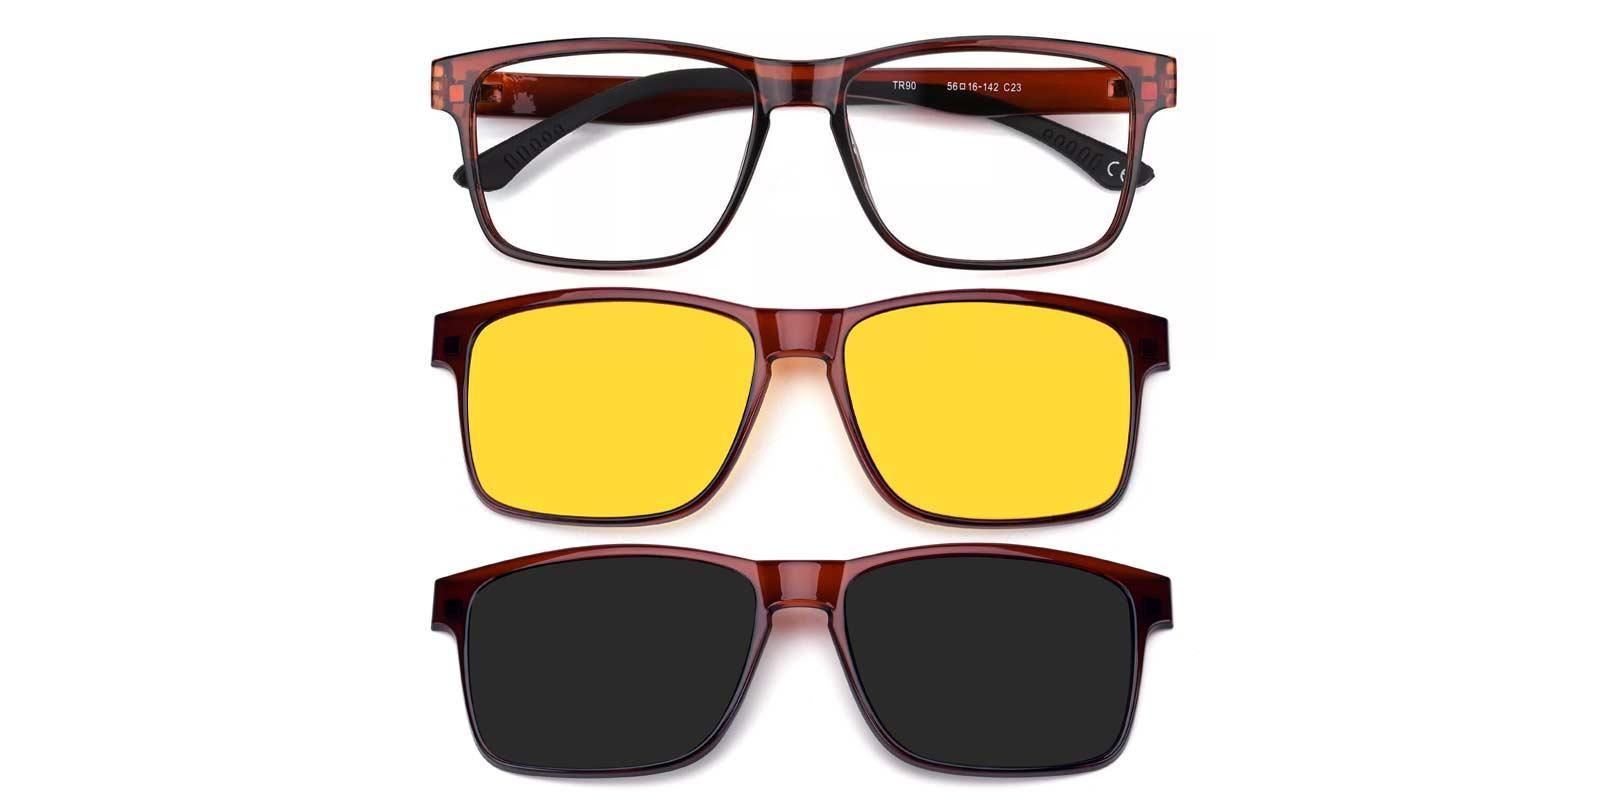 Claudia-Brown-Rectangle-Combination-Eyeglasses-detail